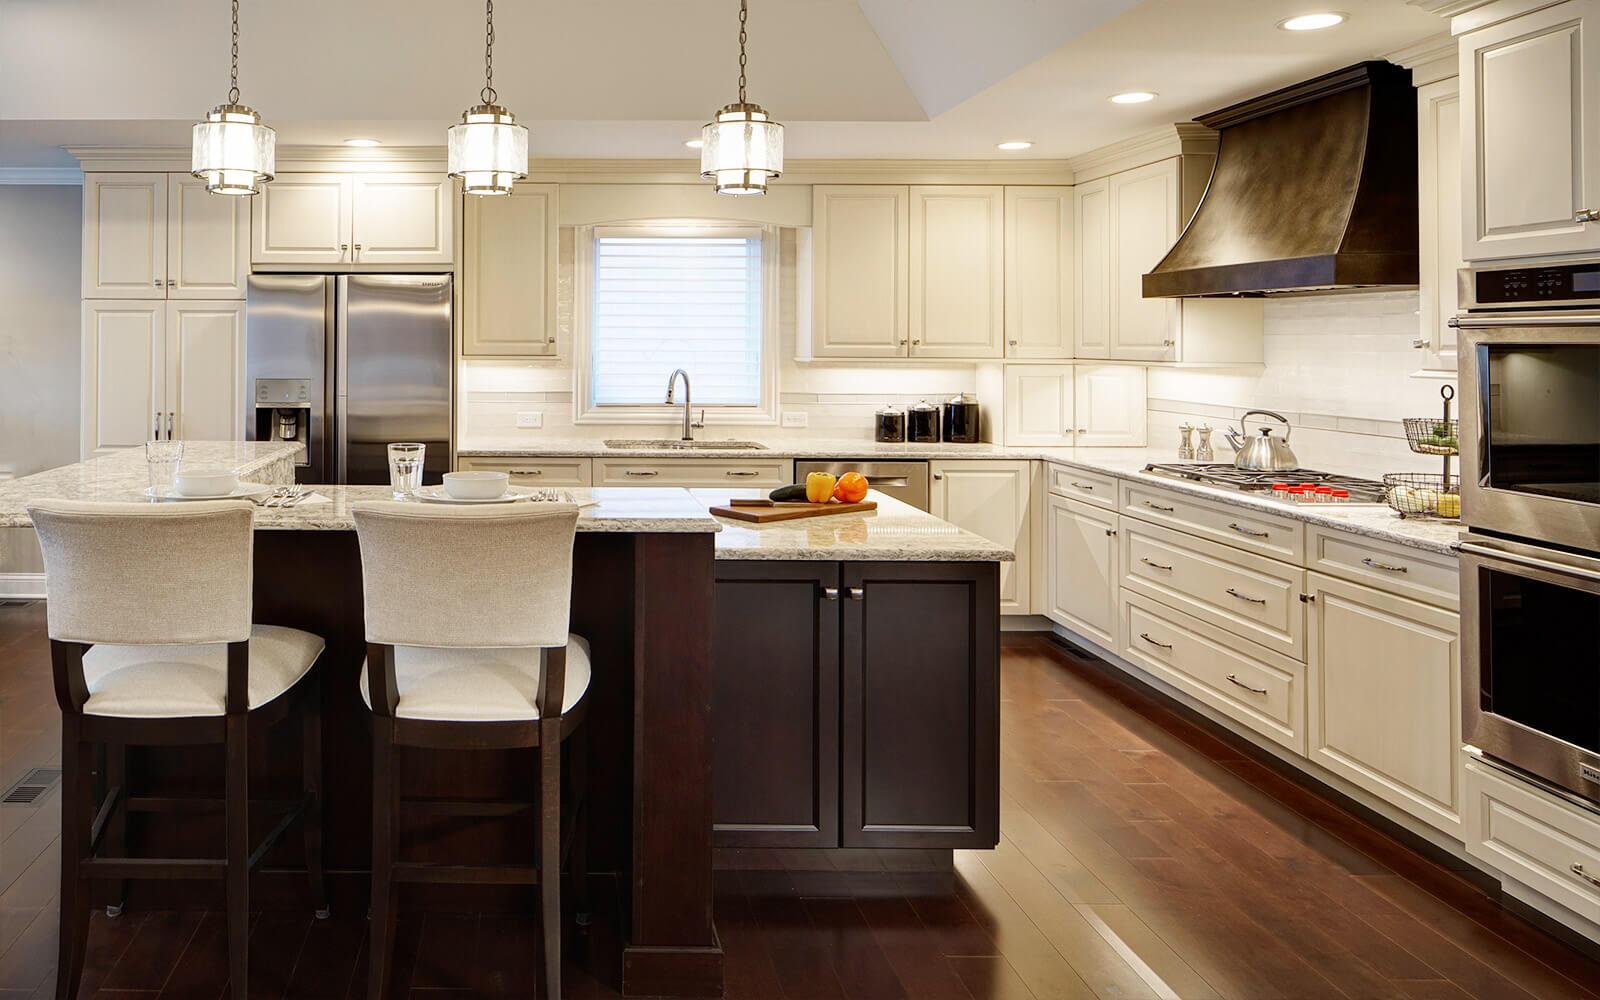 Traditional Kitchen Design - Drury Design on Traditional Kitchen Decor  id=39034